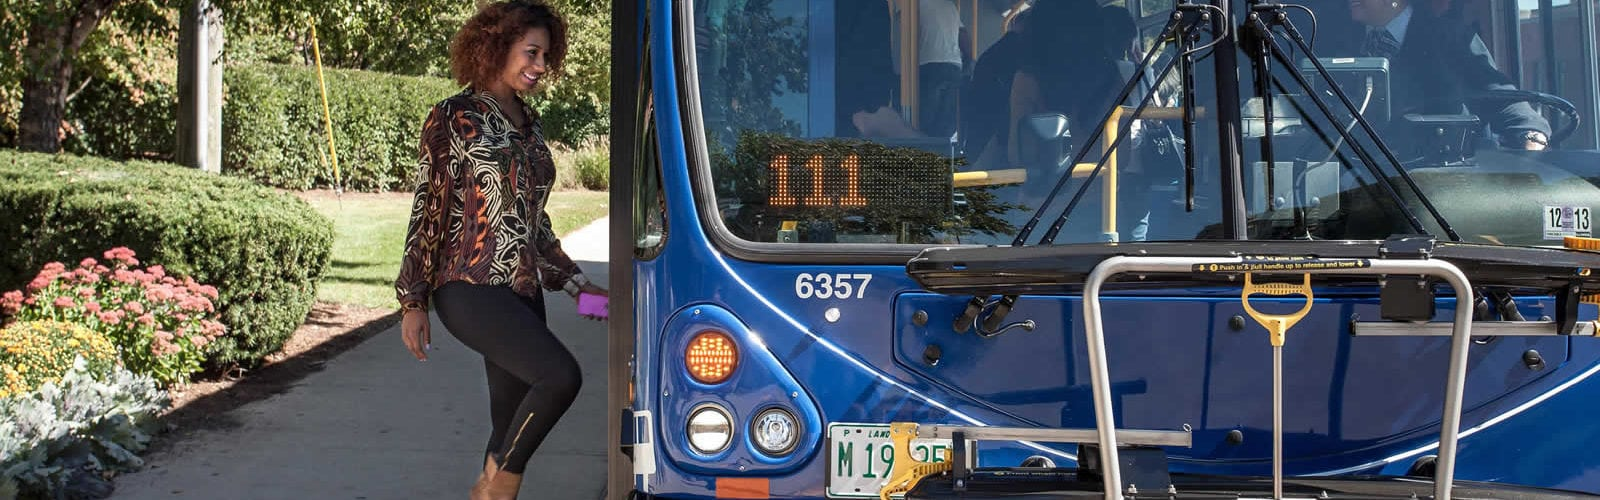 transport-commun-chicago-bus-metro-cars-trains-reseau-tarifs-une